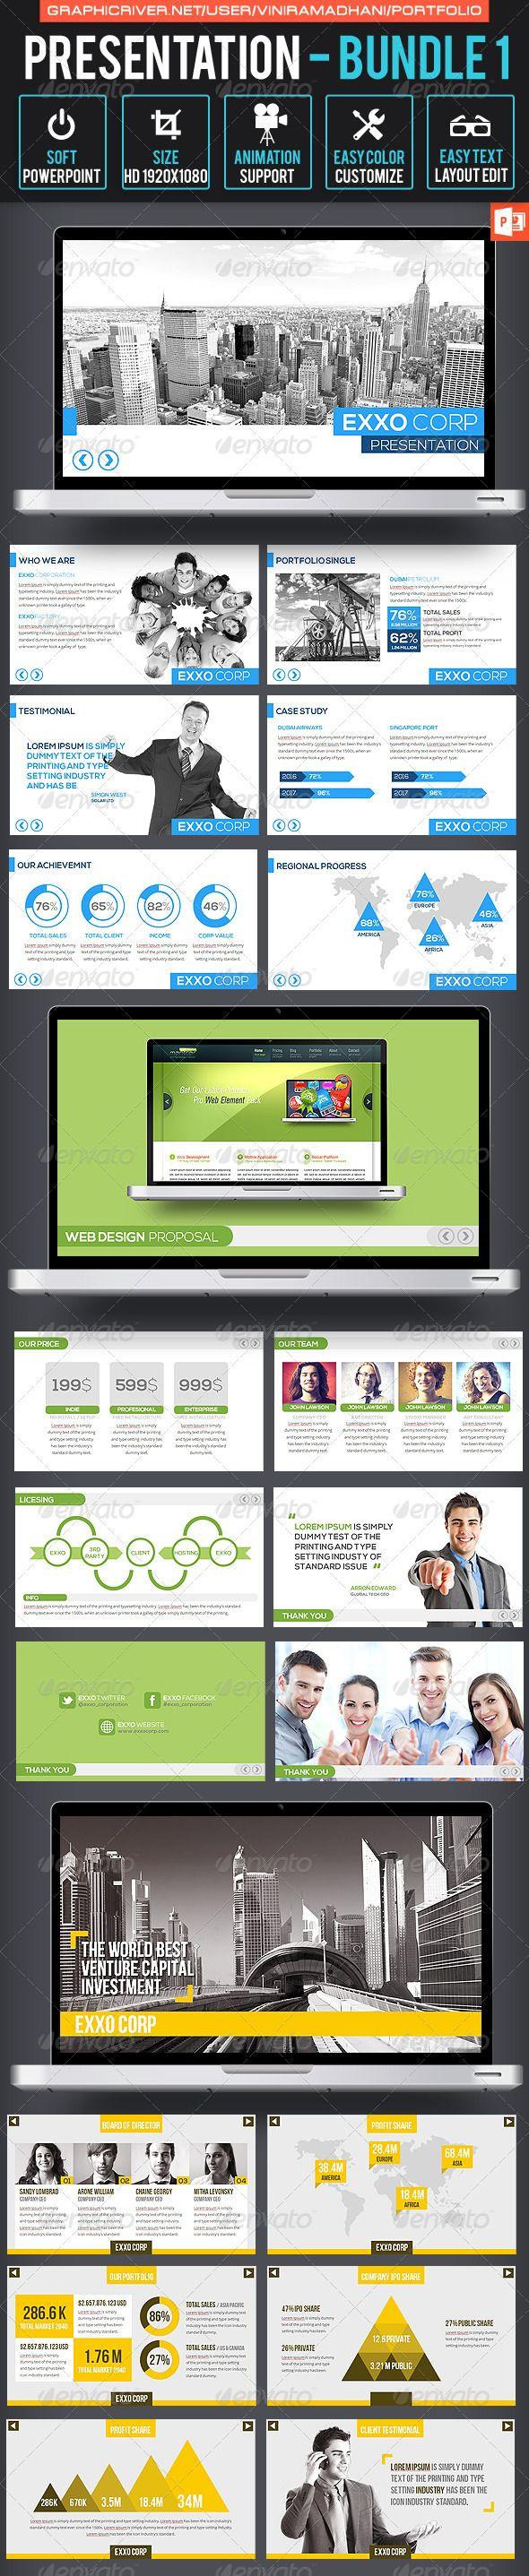 Presentation Bundle 1 - Business Powerpoint Templates